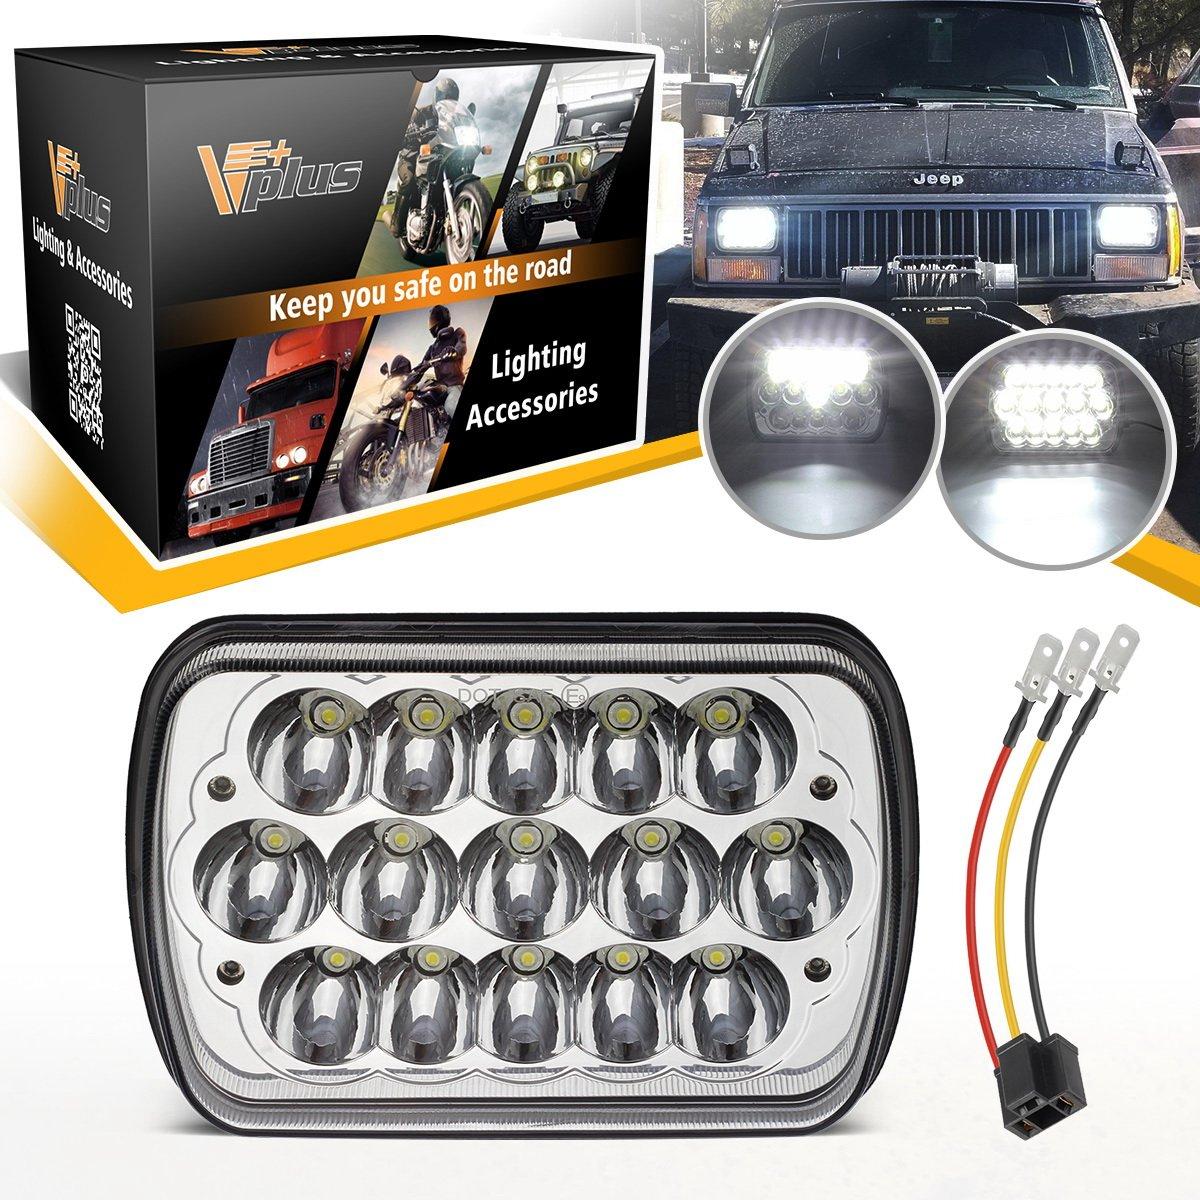 Led For Headlights >> Amazon Com Pack Of 1 Vplus Rectangular 5x7 7x6 Led Headlights